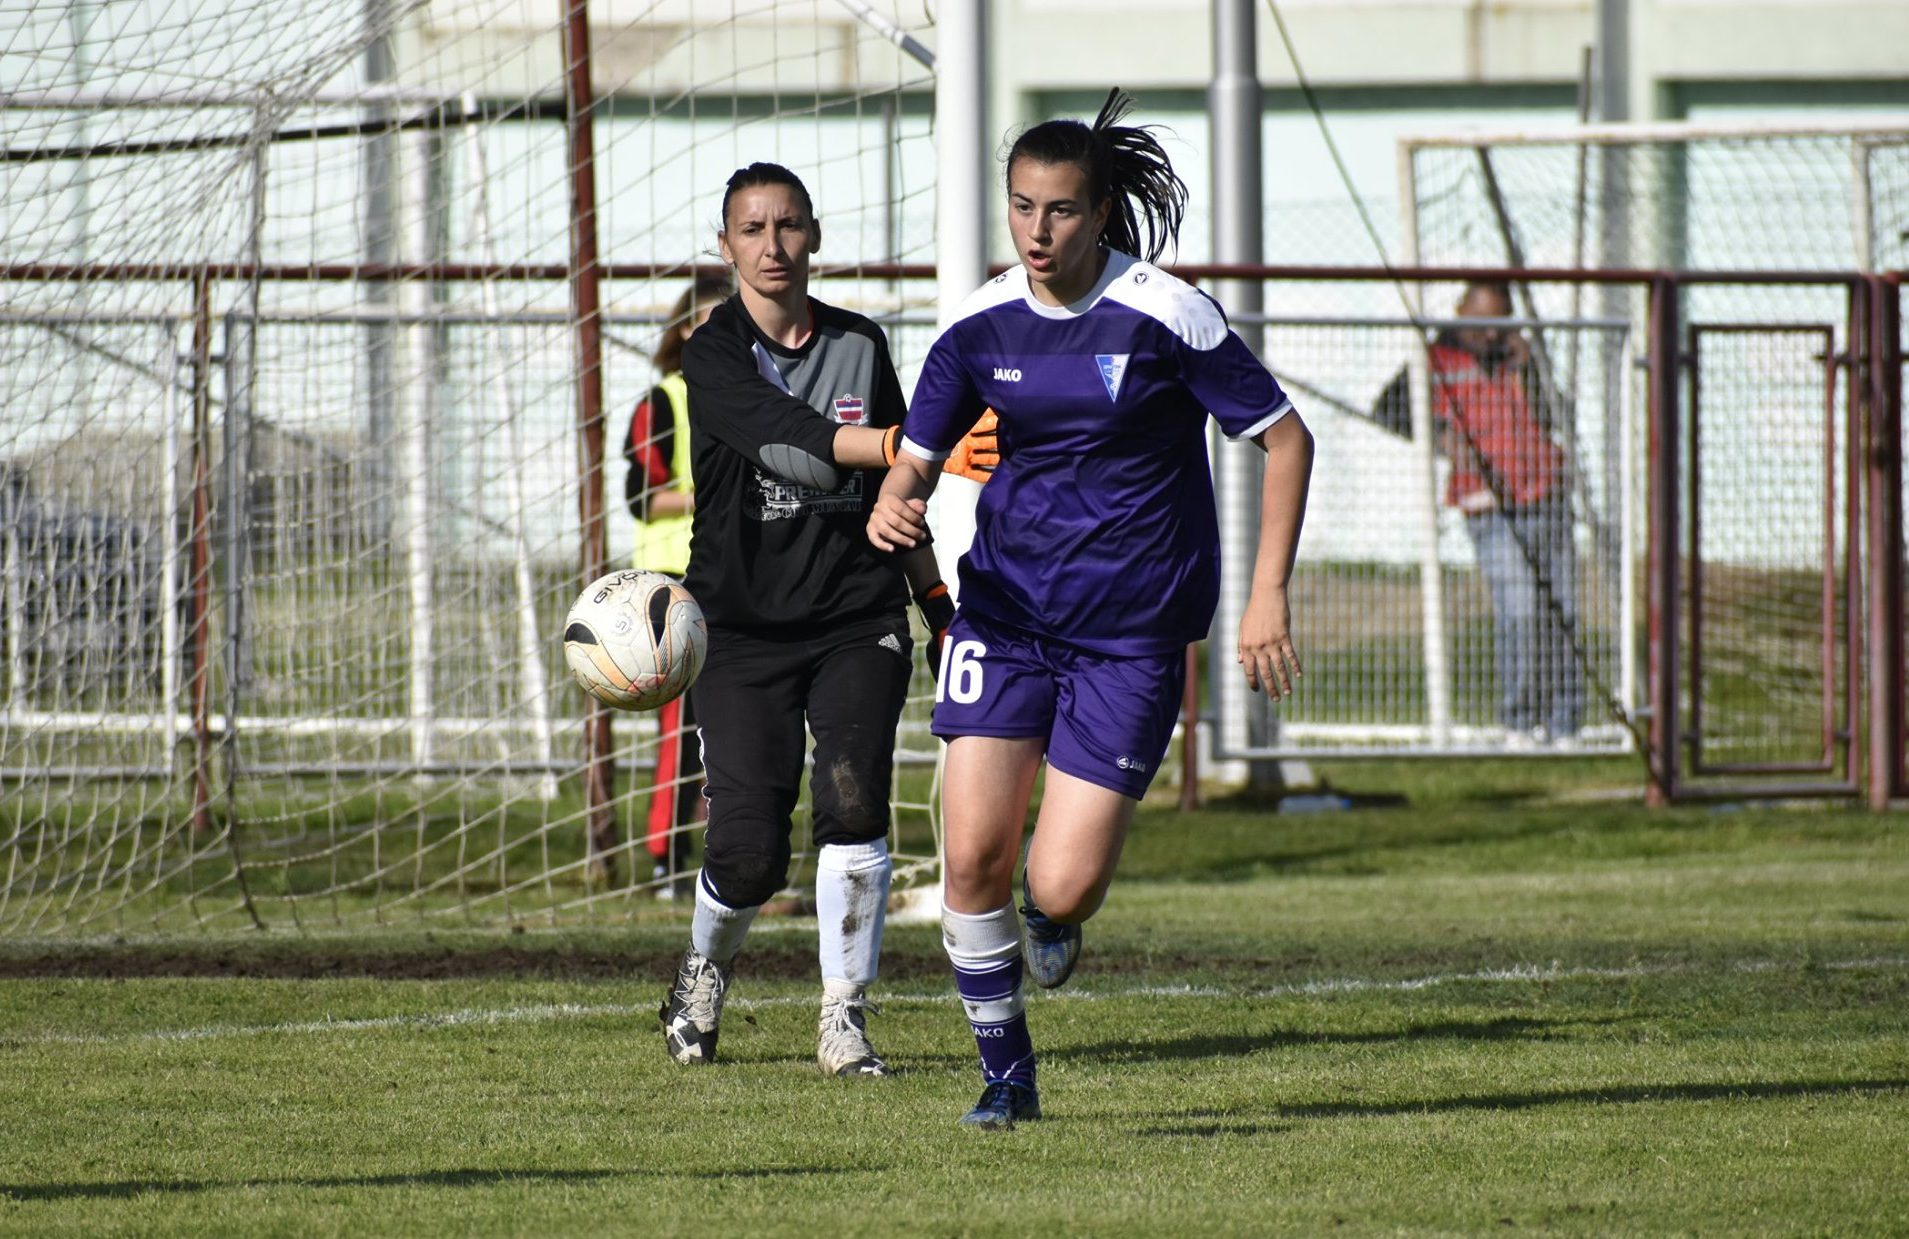 Milica Šarić: Nadam se prvom trofeju Kupa